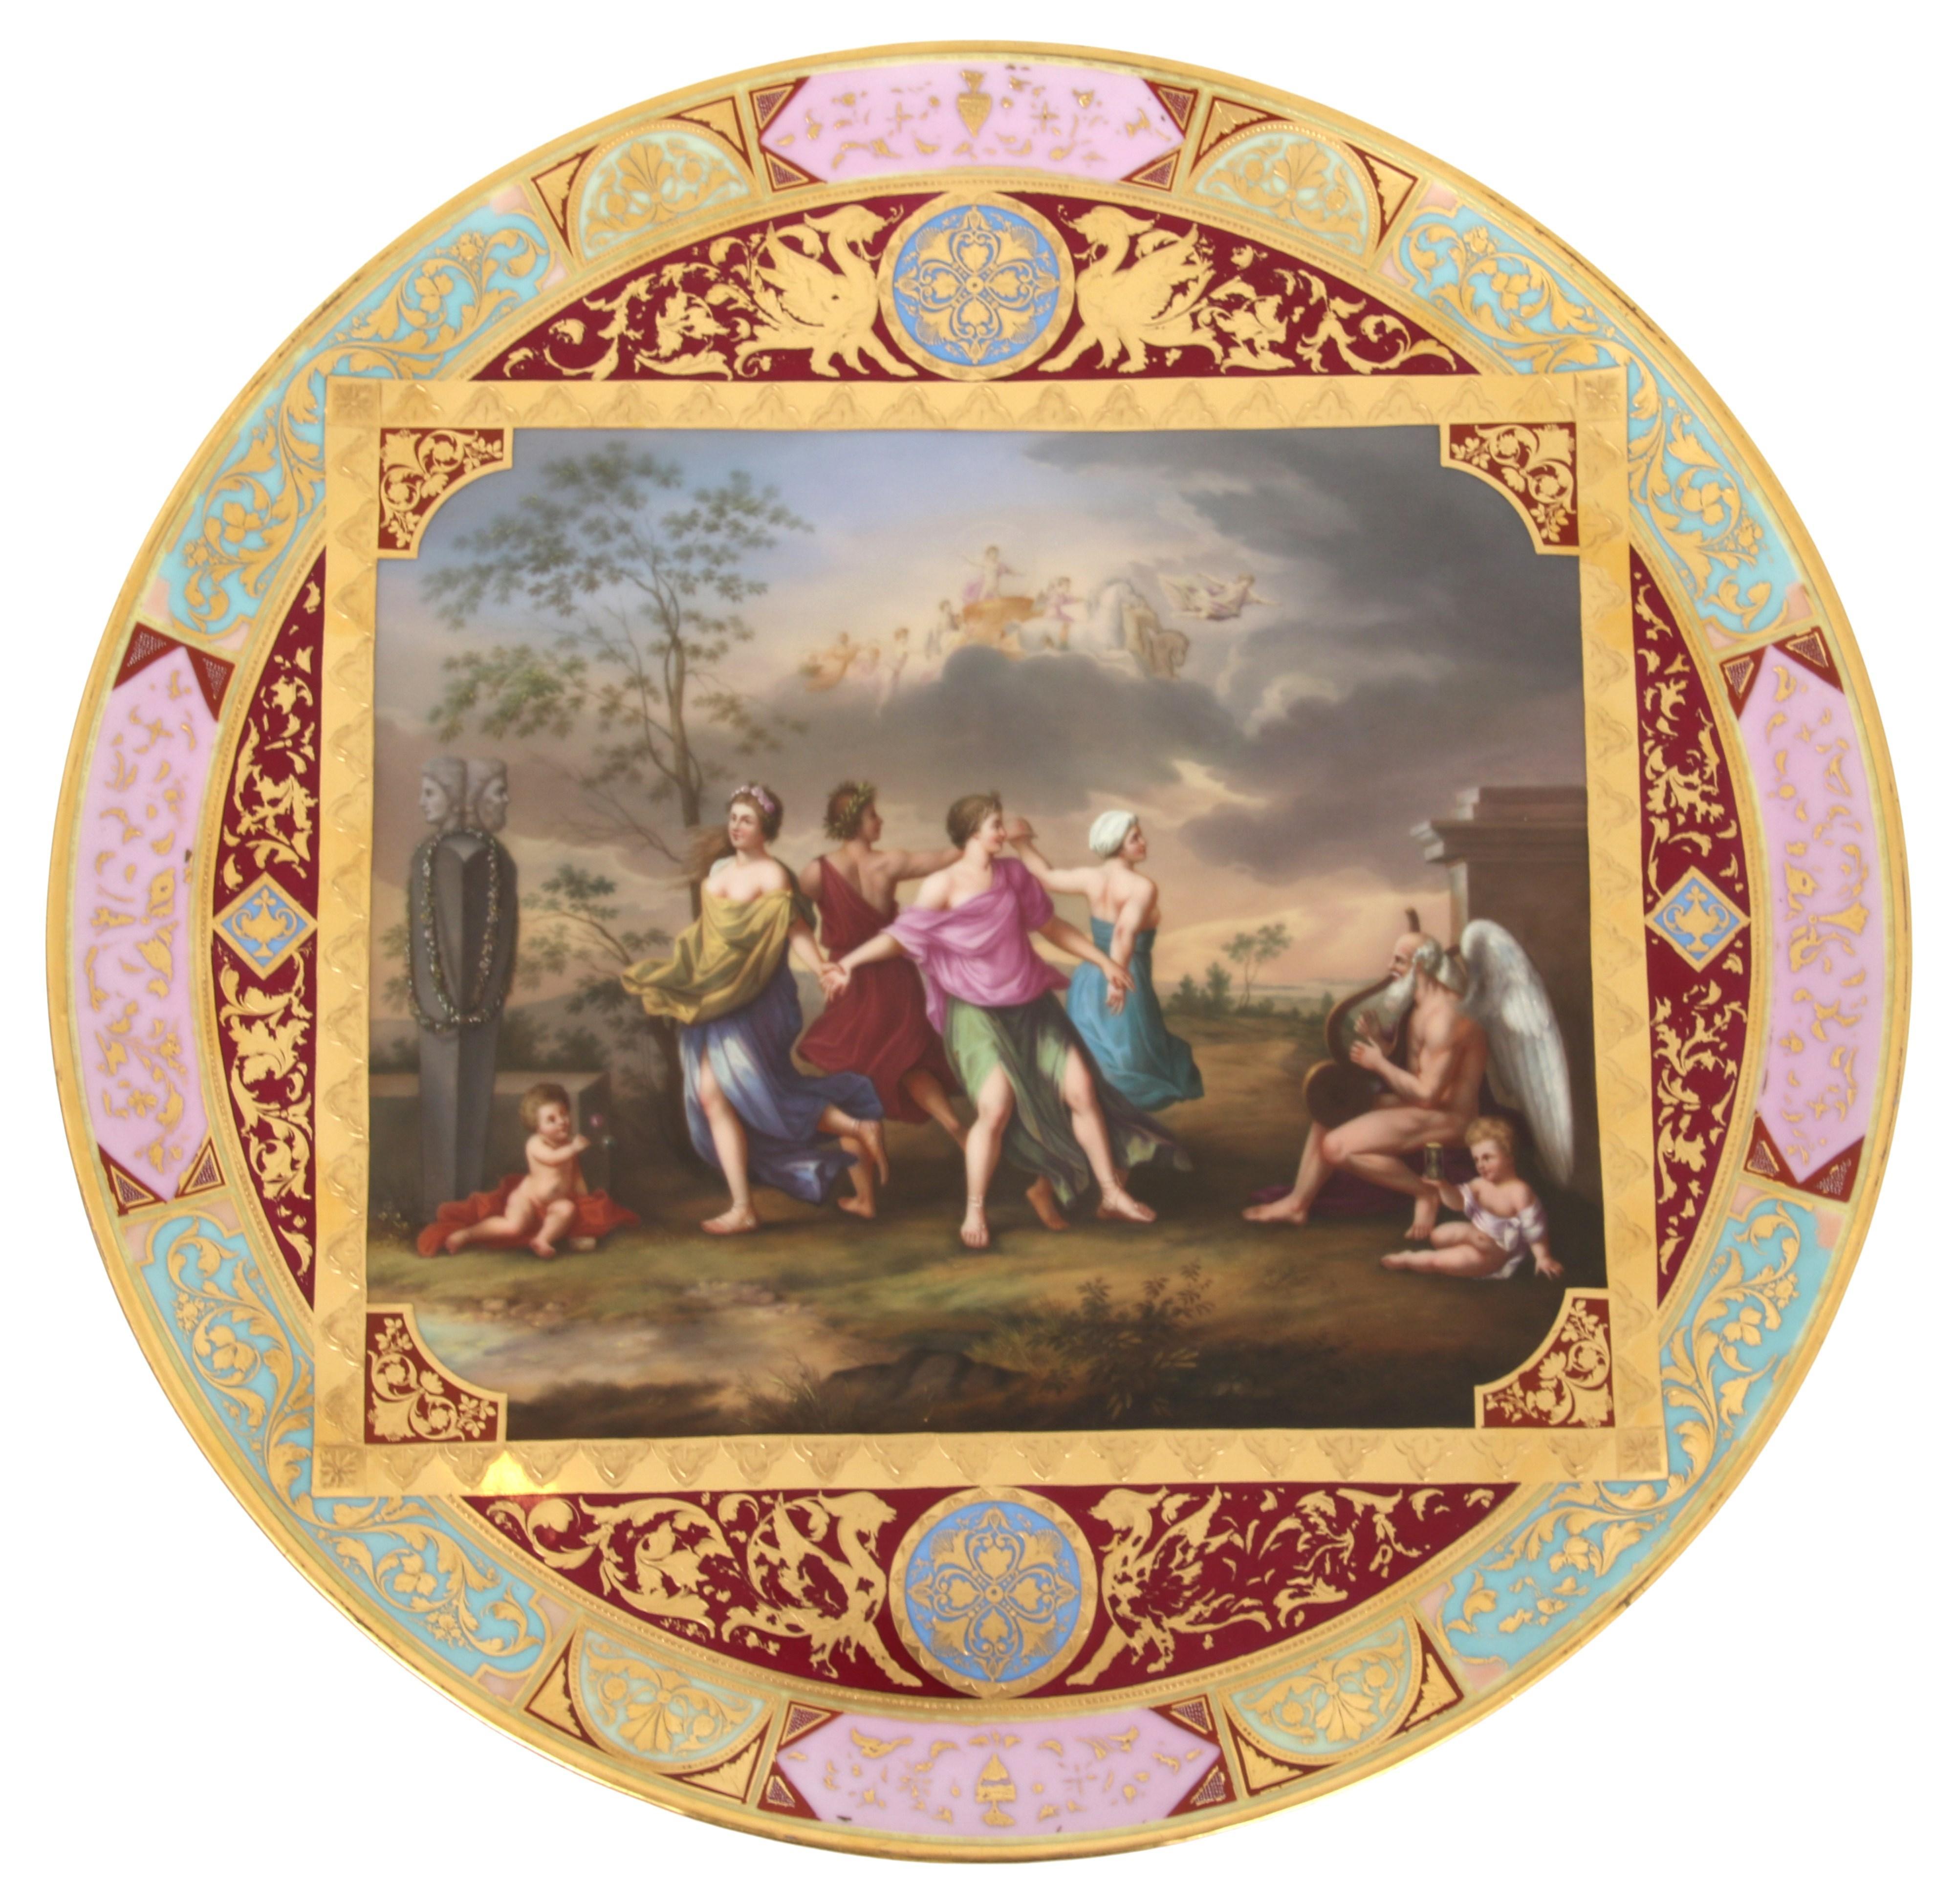 Royal Vienna Porcelain Charger